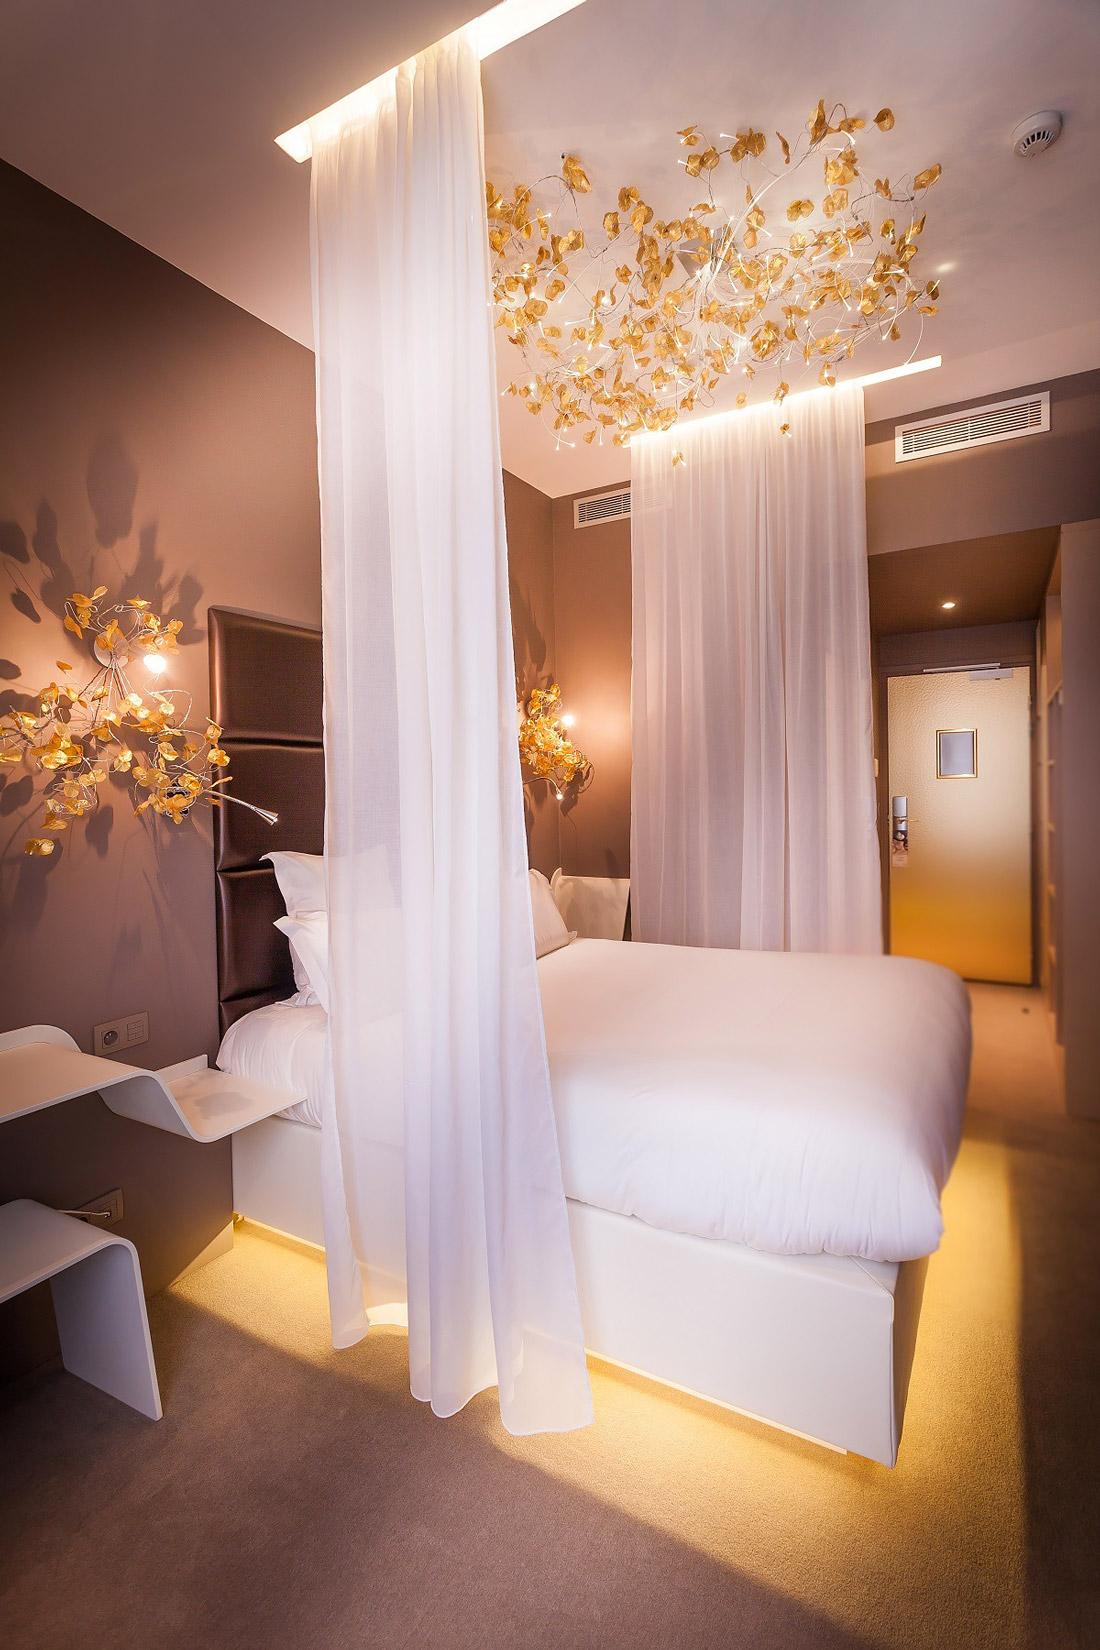 Best designed hotel room